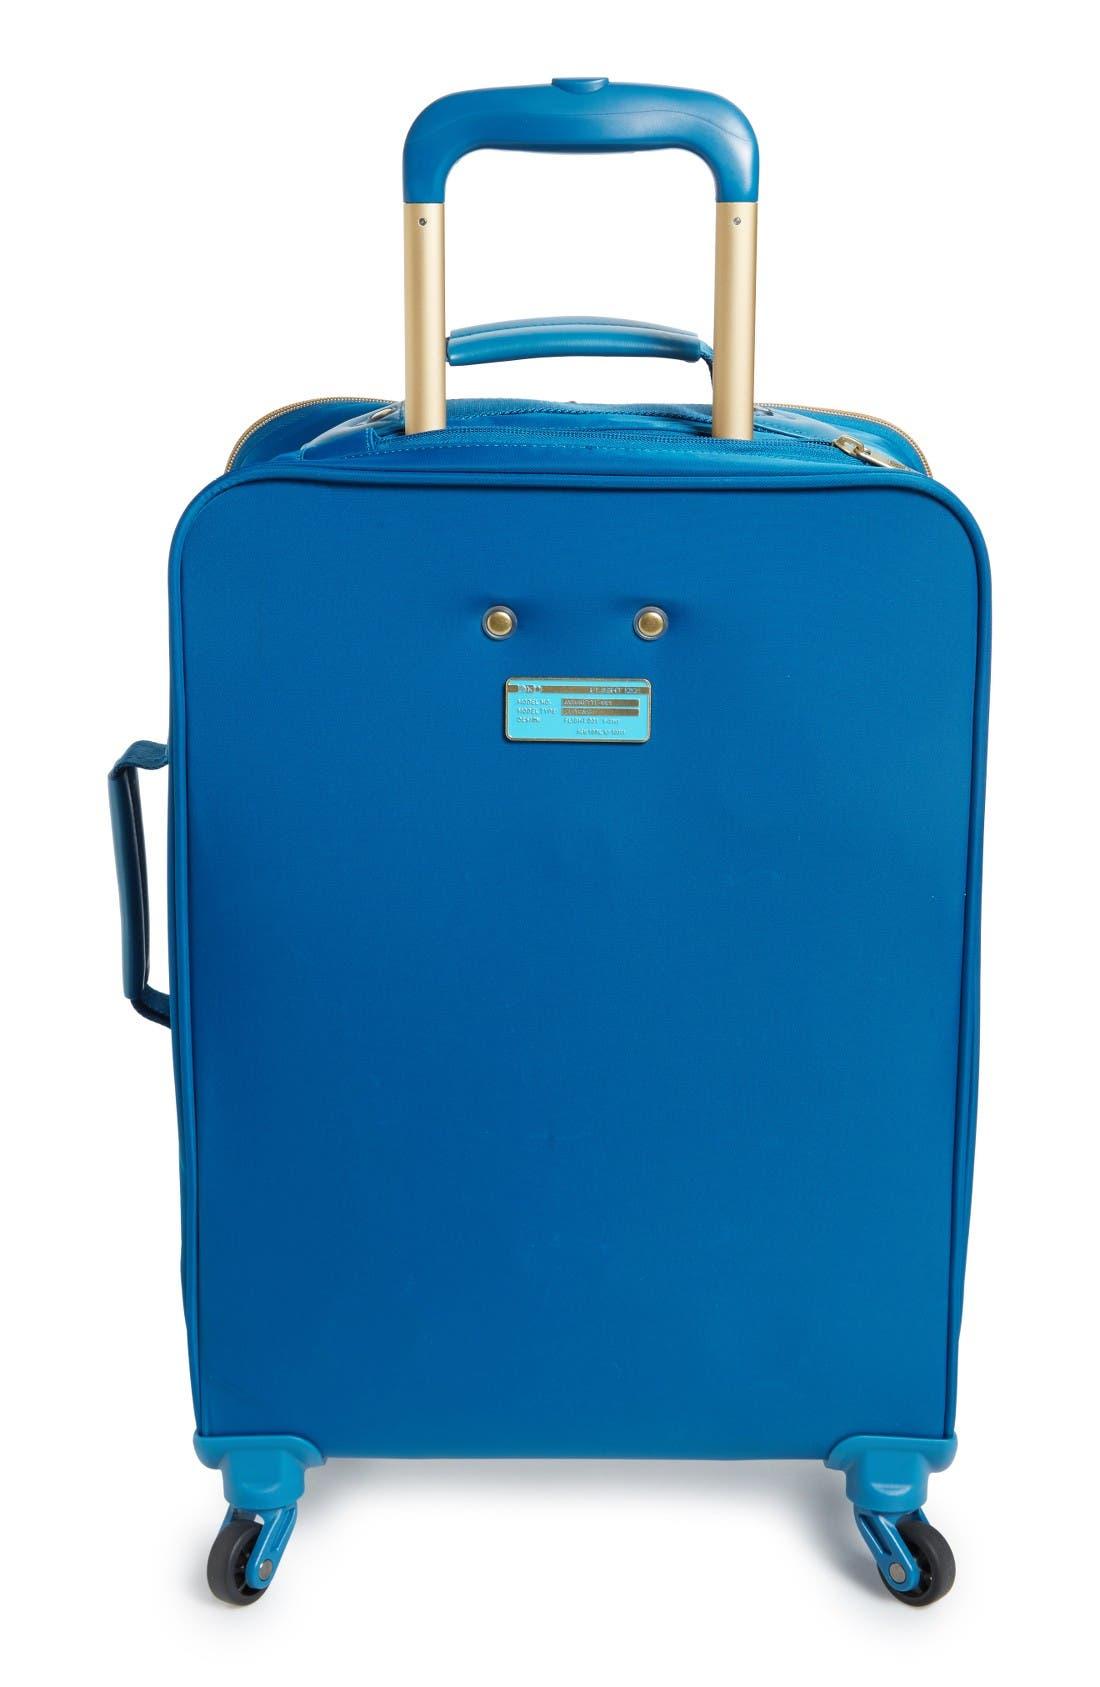 Alternate Image 2  - Flight 001 Avionette 19-Inch Rolling Carry-On Suitcase